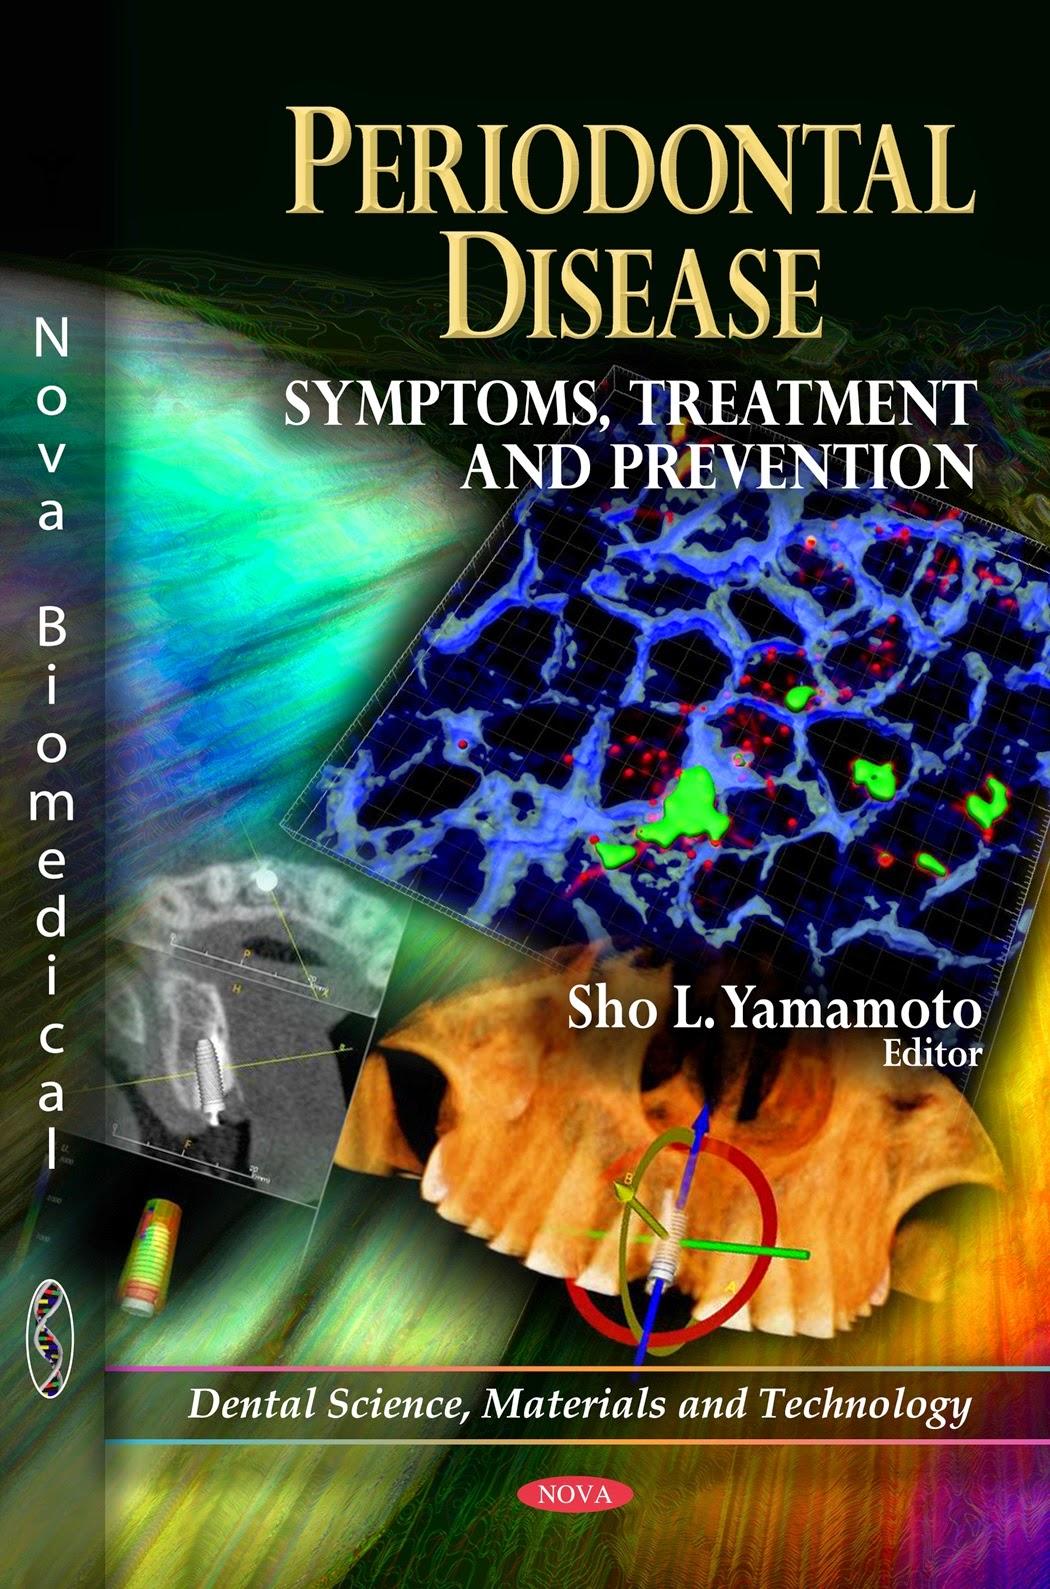 PERIODONTAL DISEASE... SYMPTOMS,TREATMENT AND PREVENTION - SHO L. YAMAMOTO - © 2011.PDF